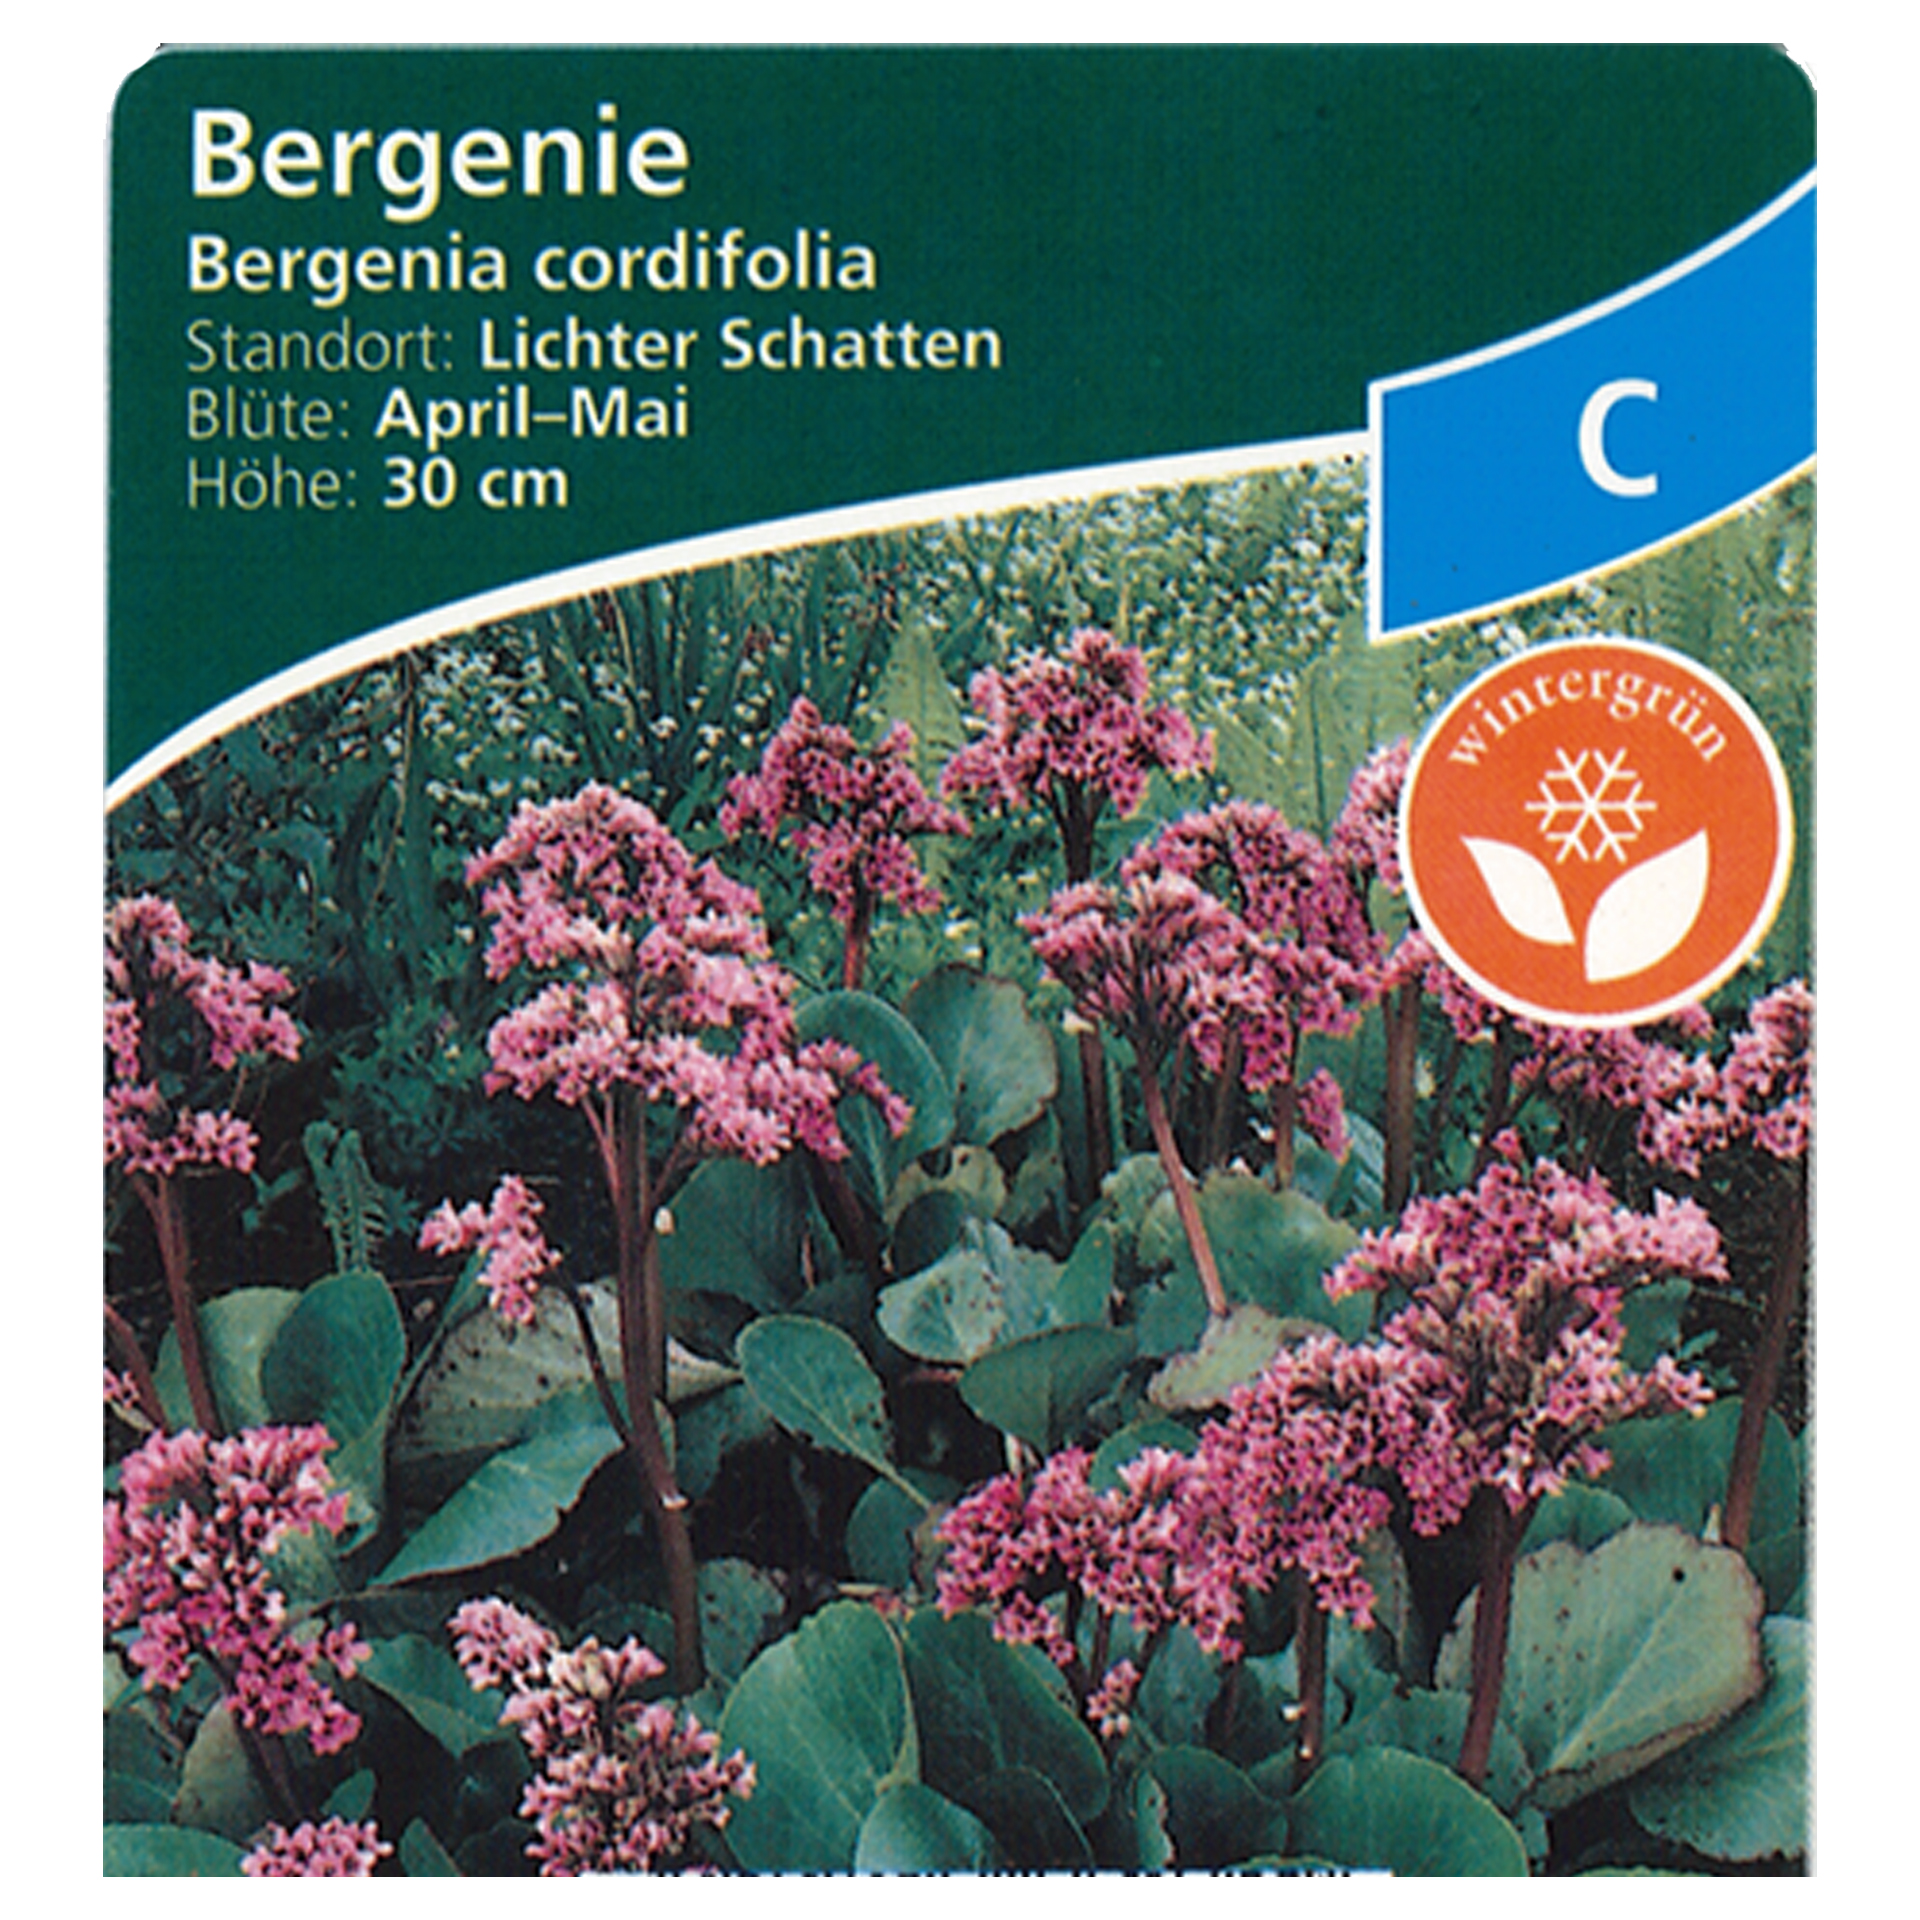 Bergenie - Bergenia cordifolia, 9cm Topf